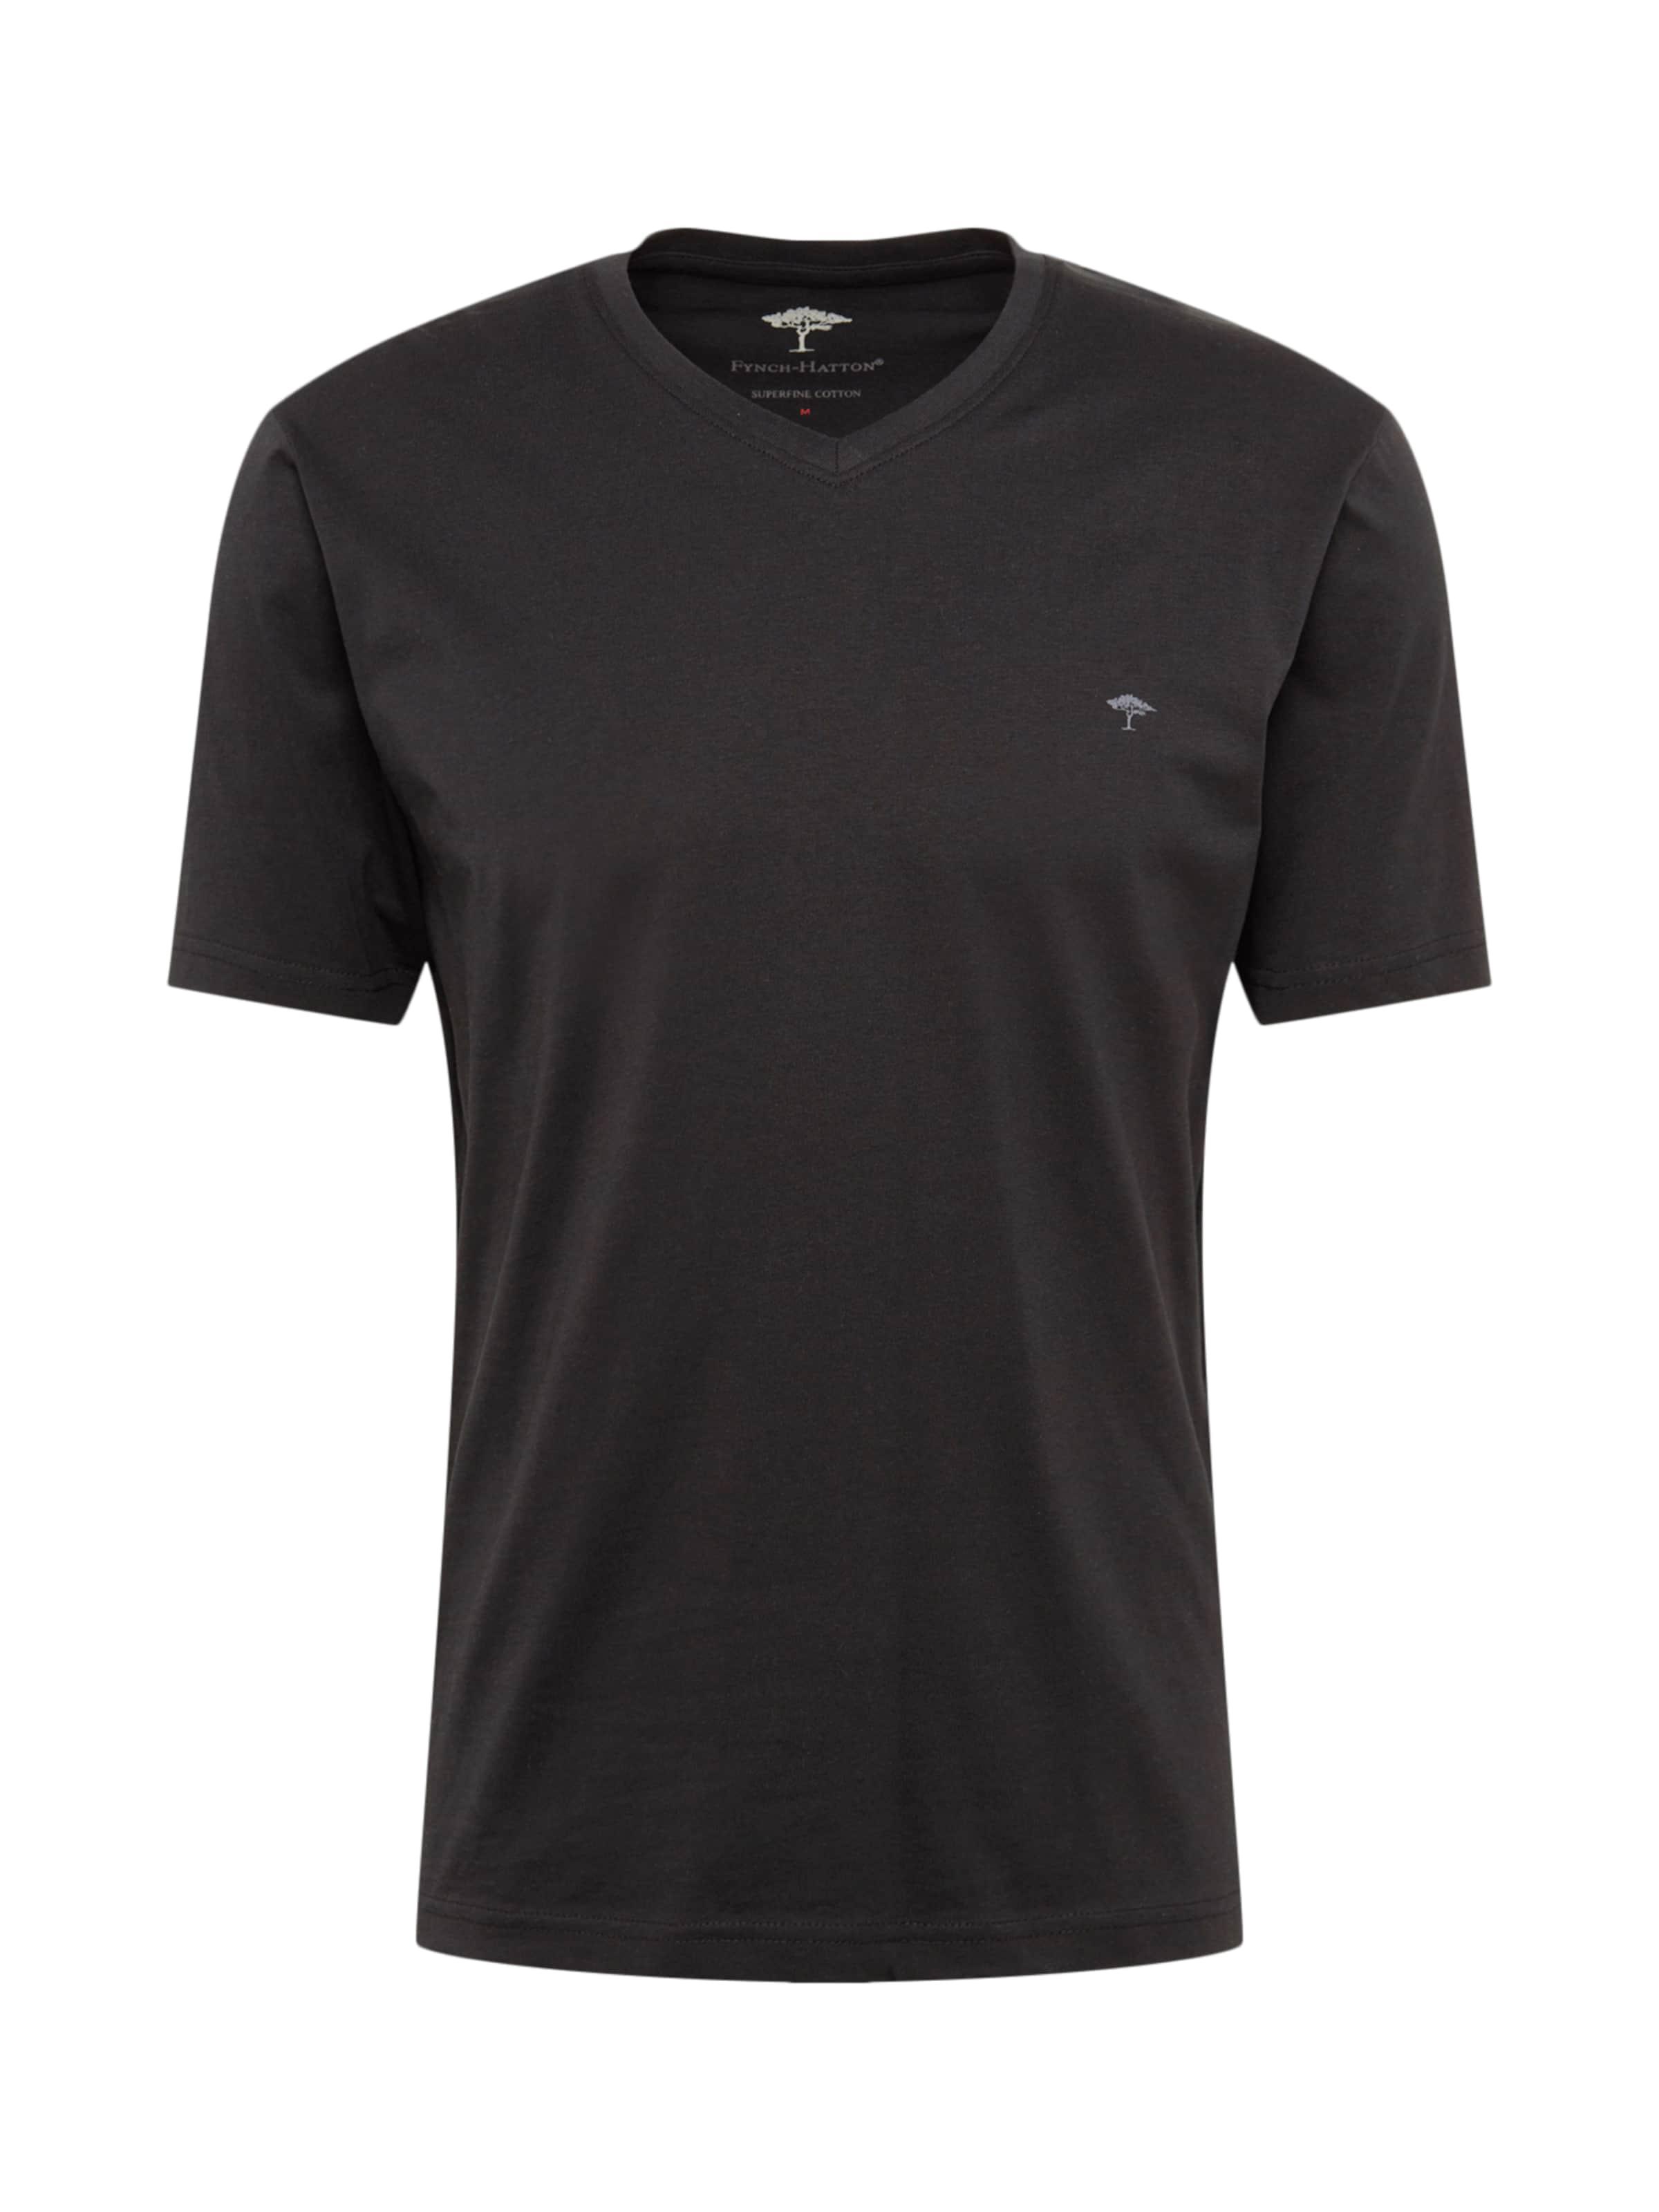 T Fynch En Noir hatton shirt 4AqjRL35